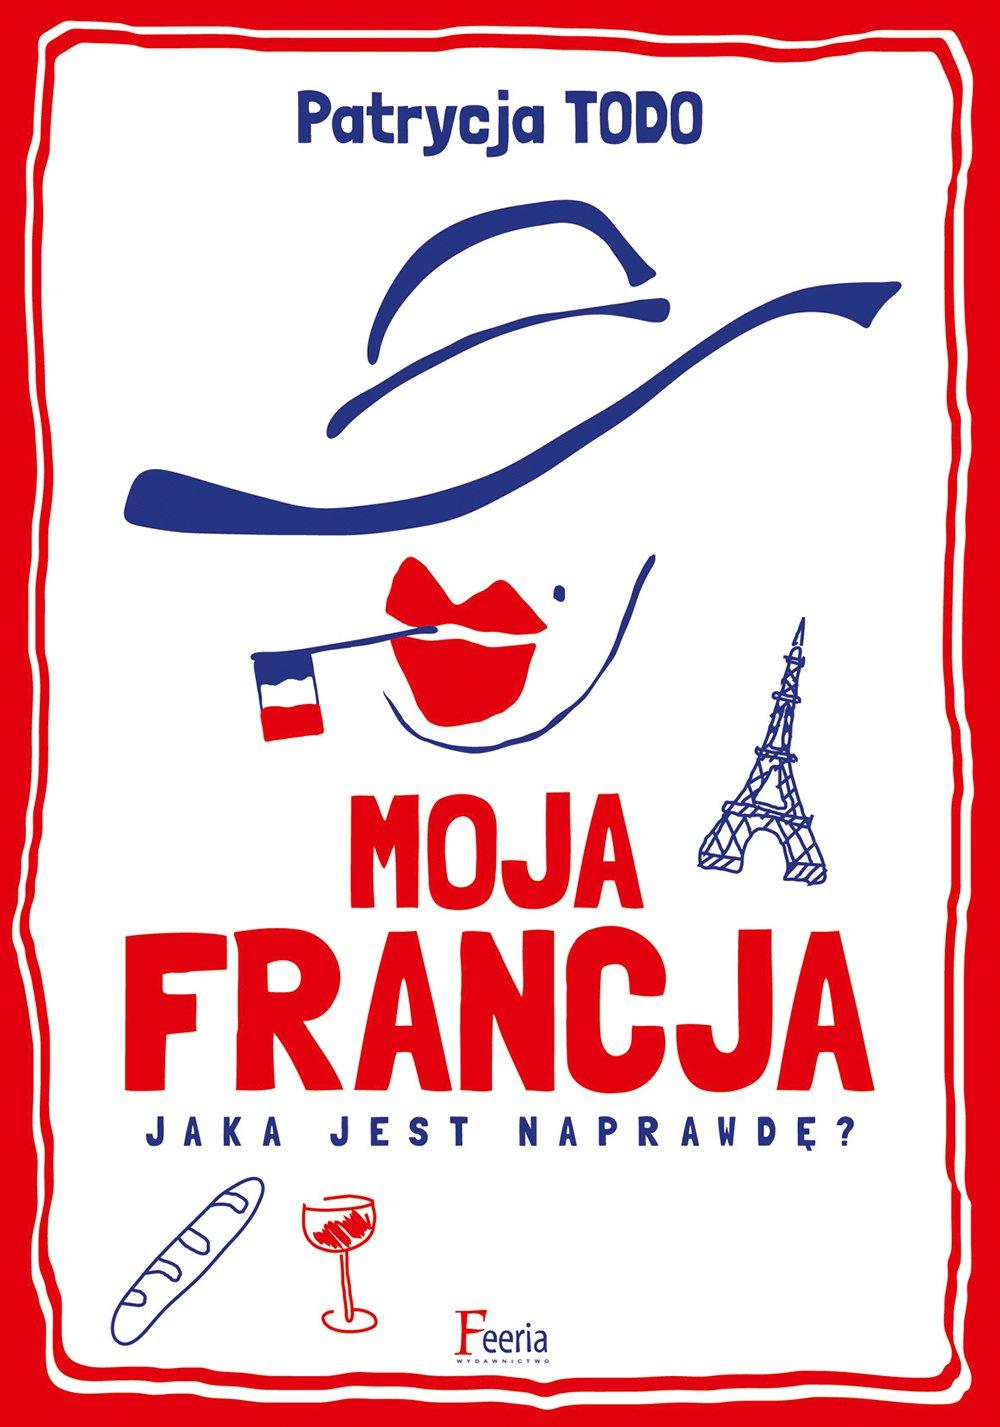 Moja Francja - Ebook (Książka EPUB) do pobrania w formacie EPUB